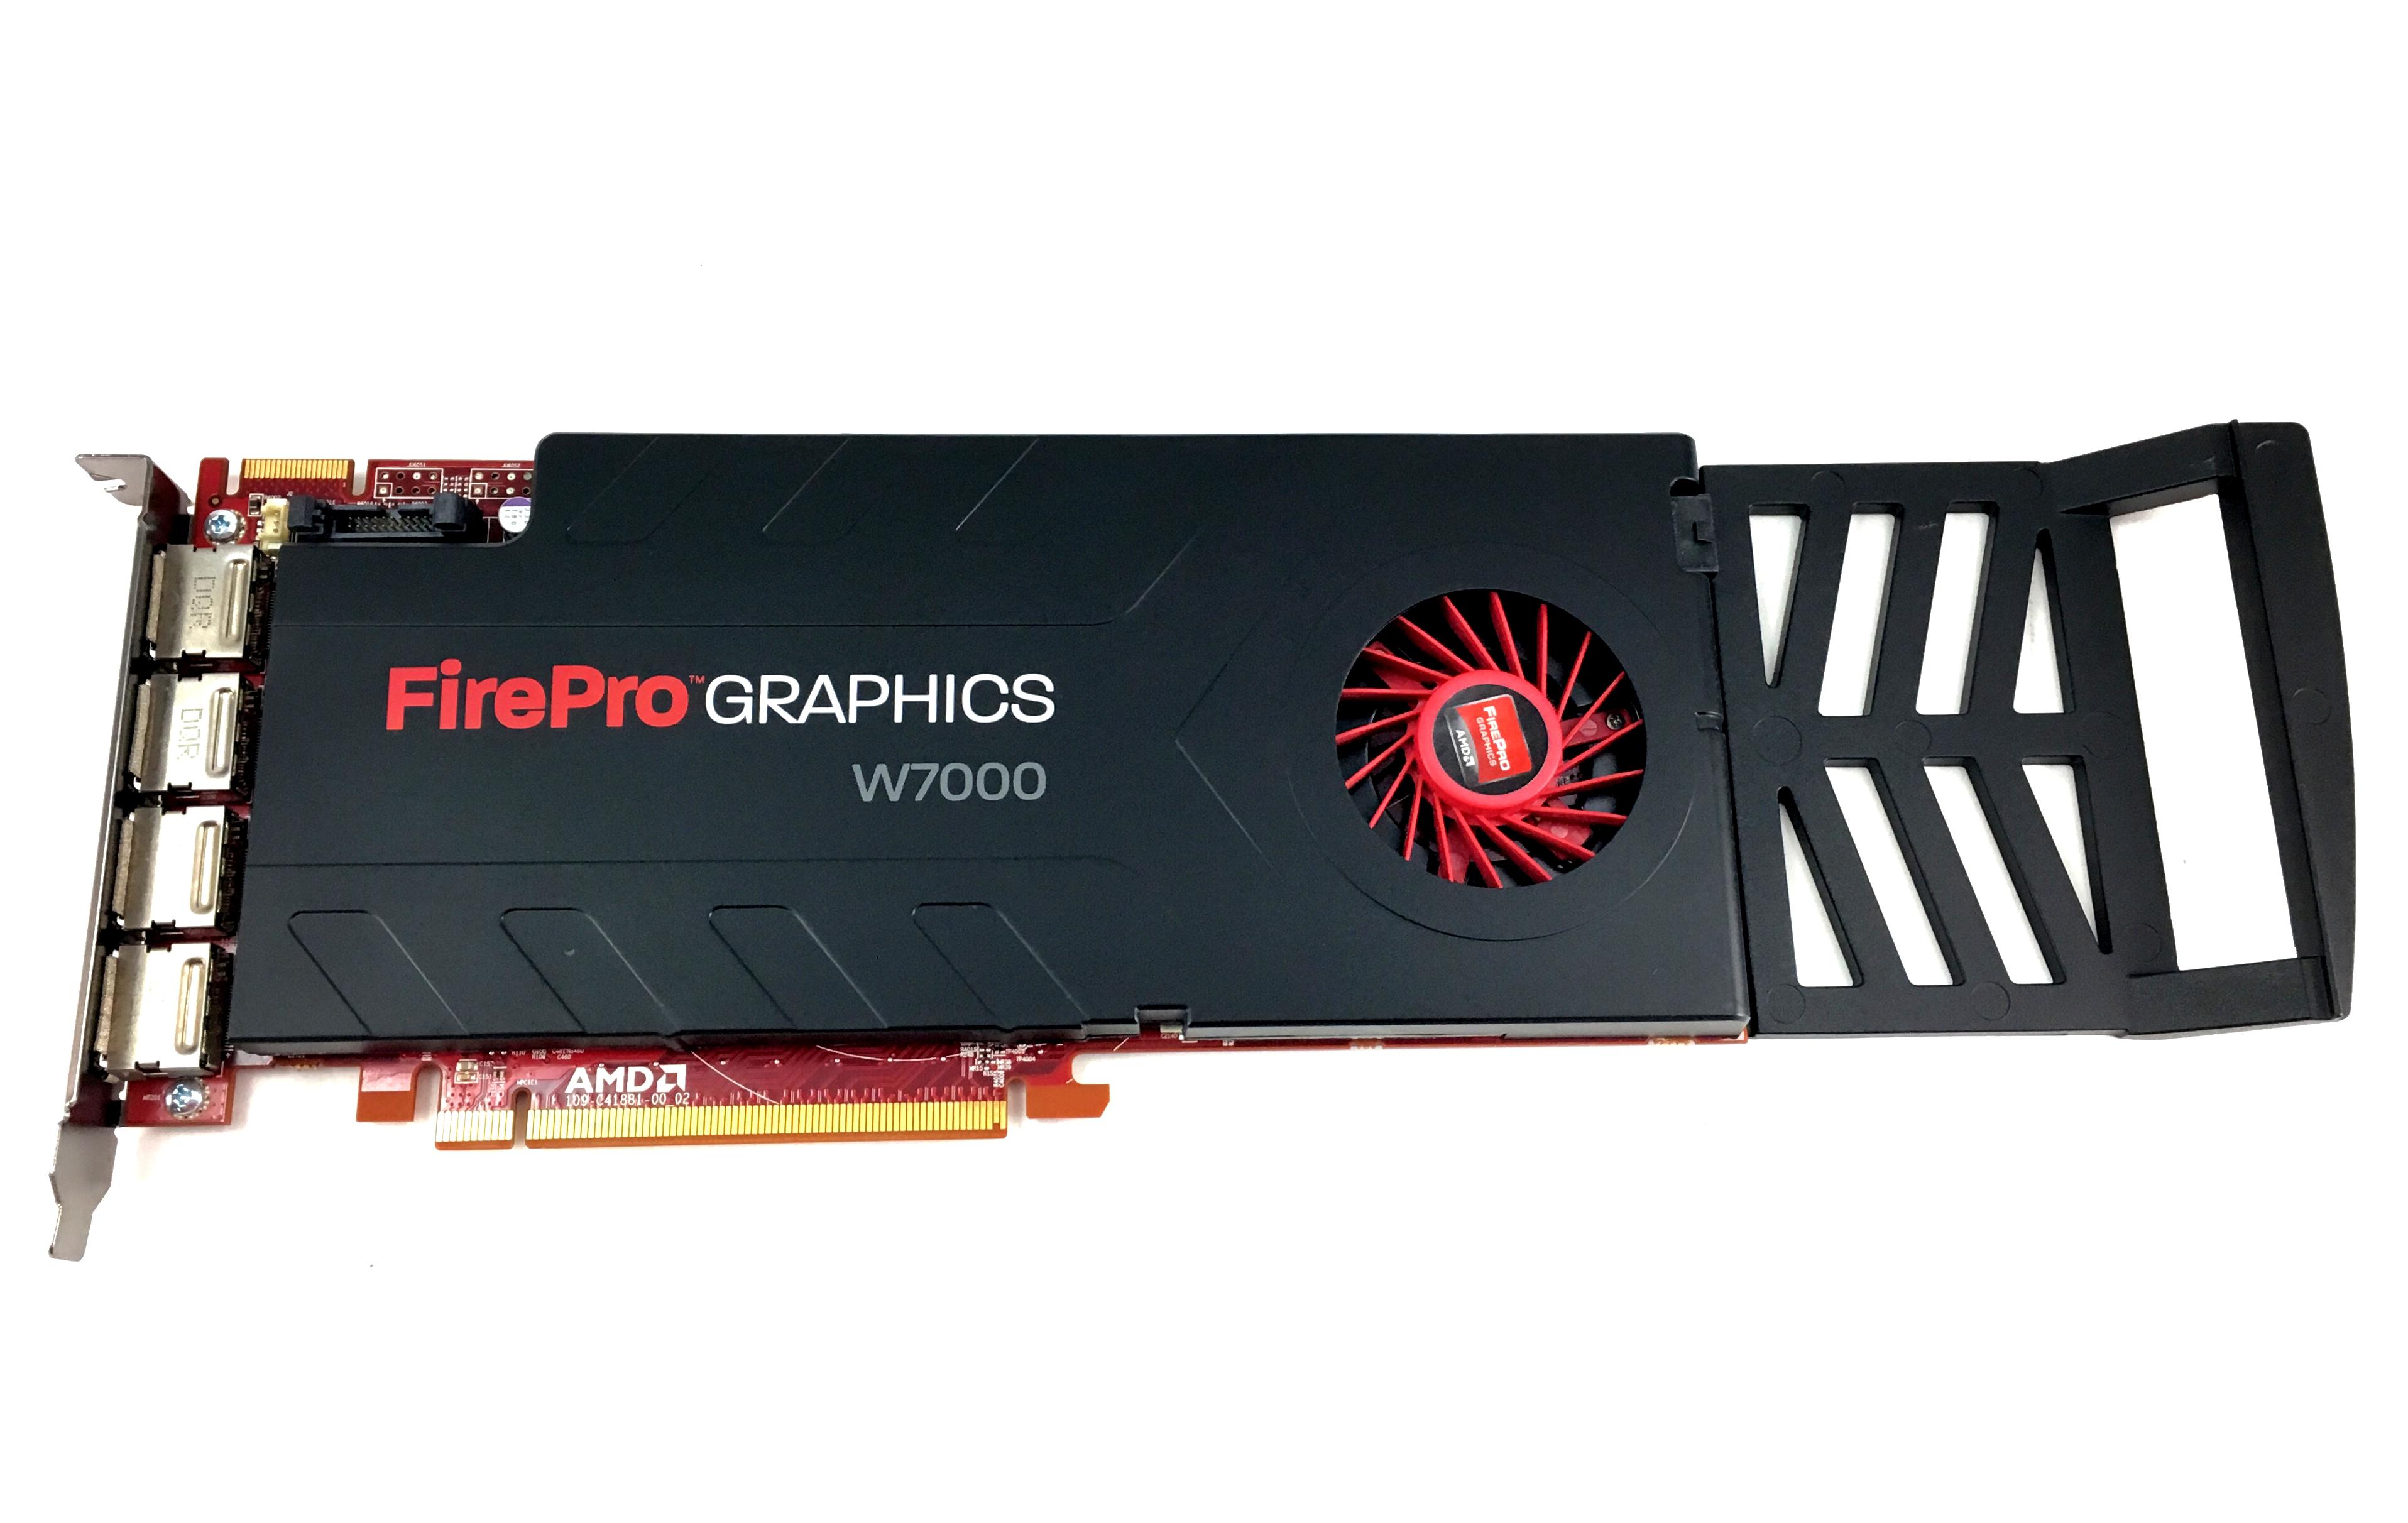 0CHF4P Dell AMD FirePro W7000 4GB GDDR5 Graphics Card